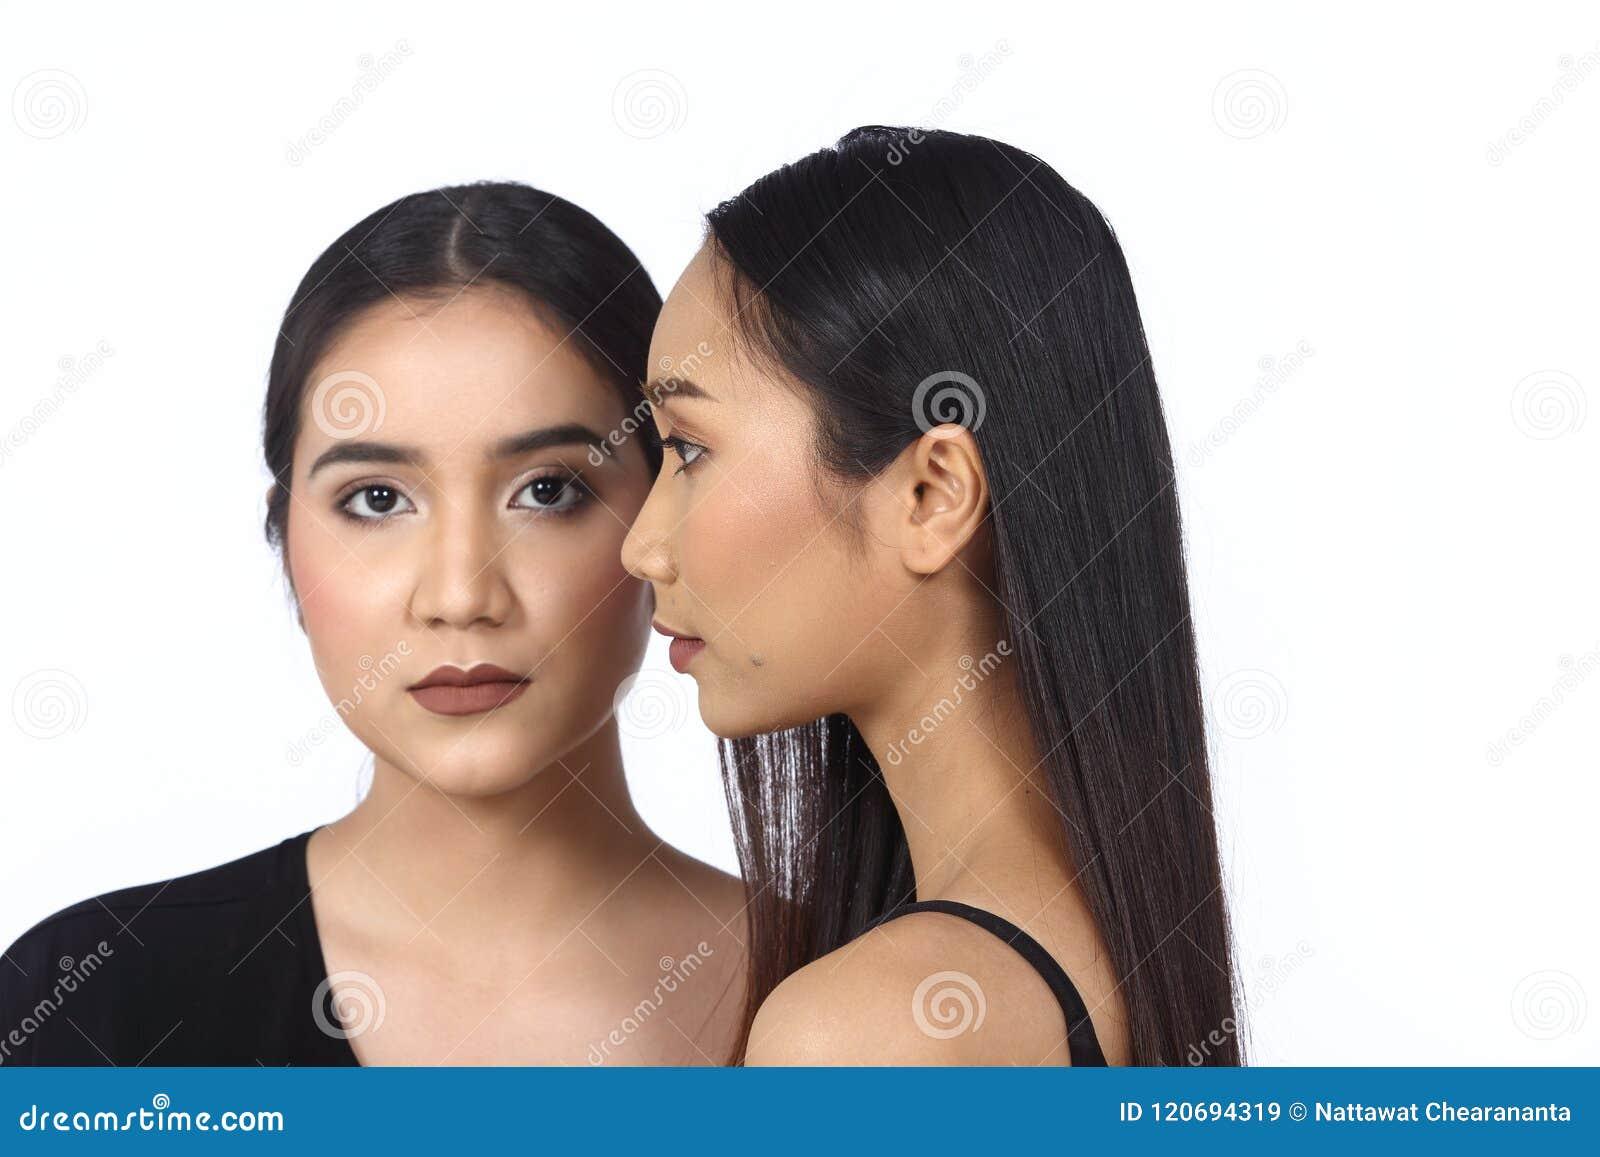 Fucking My Girl Friends Sister